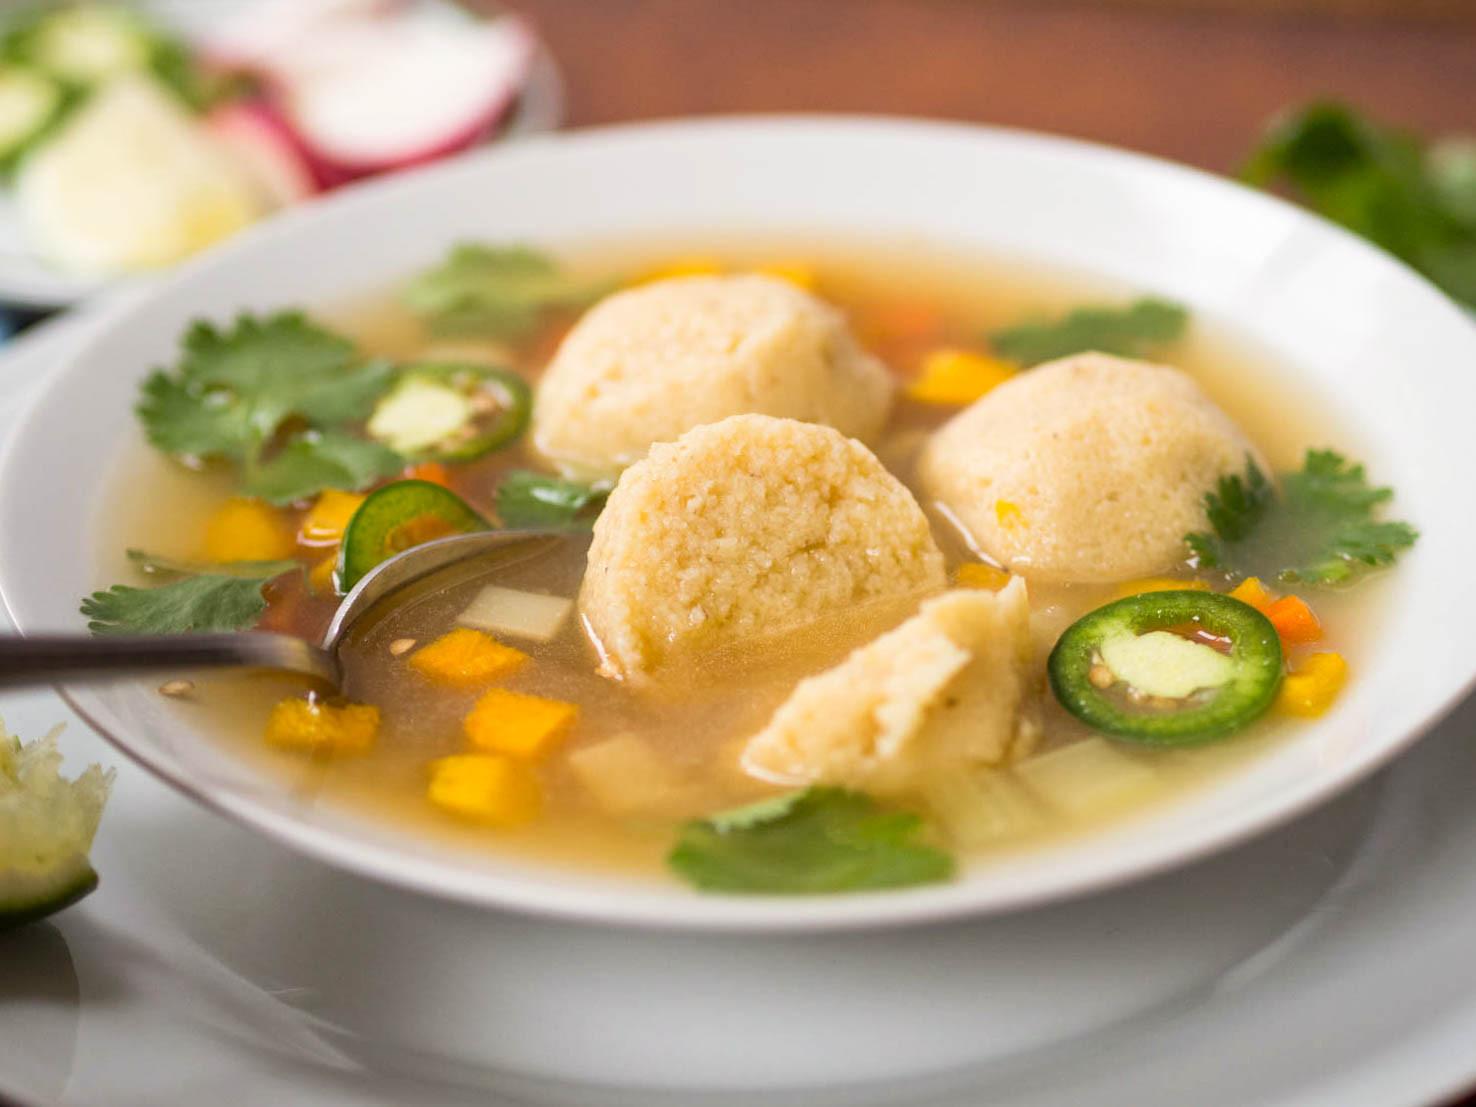 Soup Dumplings Recipe  Masa Ball Soup Mexican Corn Dumplings in Chicken Soup